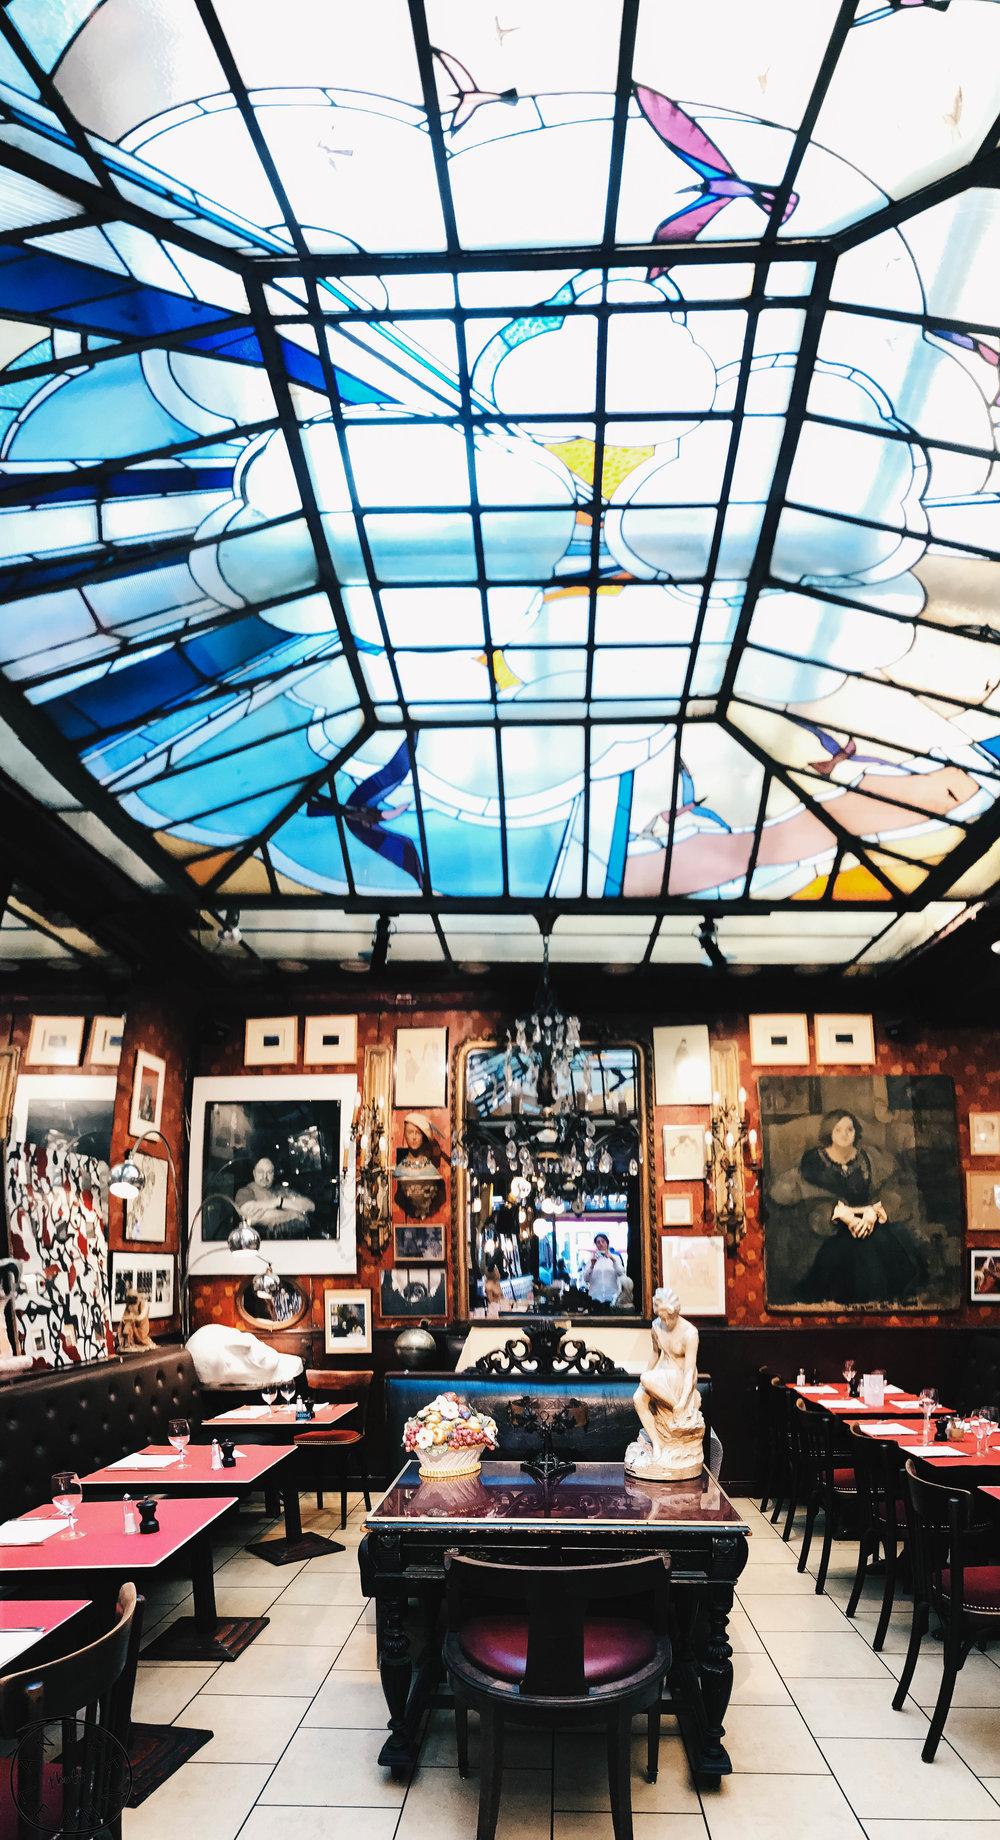 Cafe Palais - Reims, France